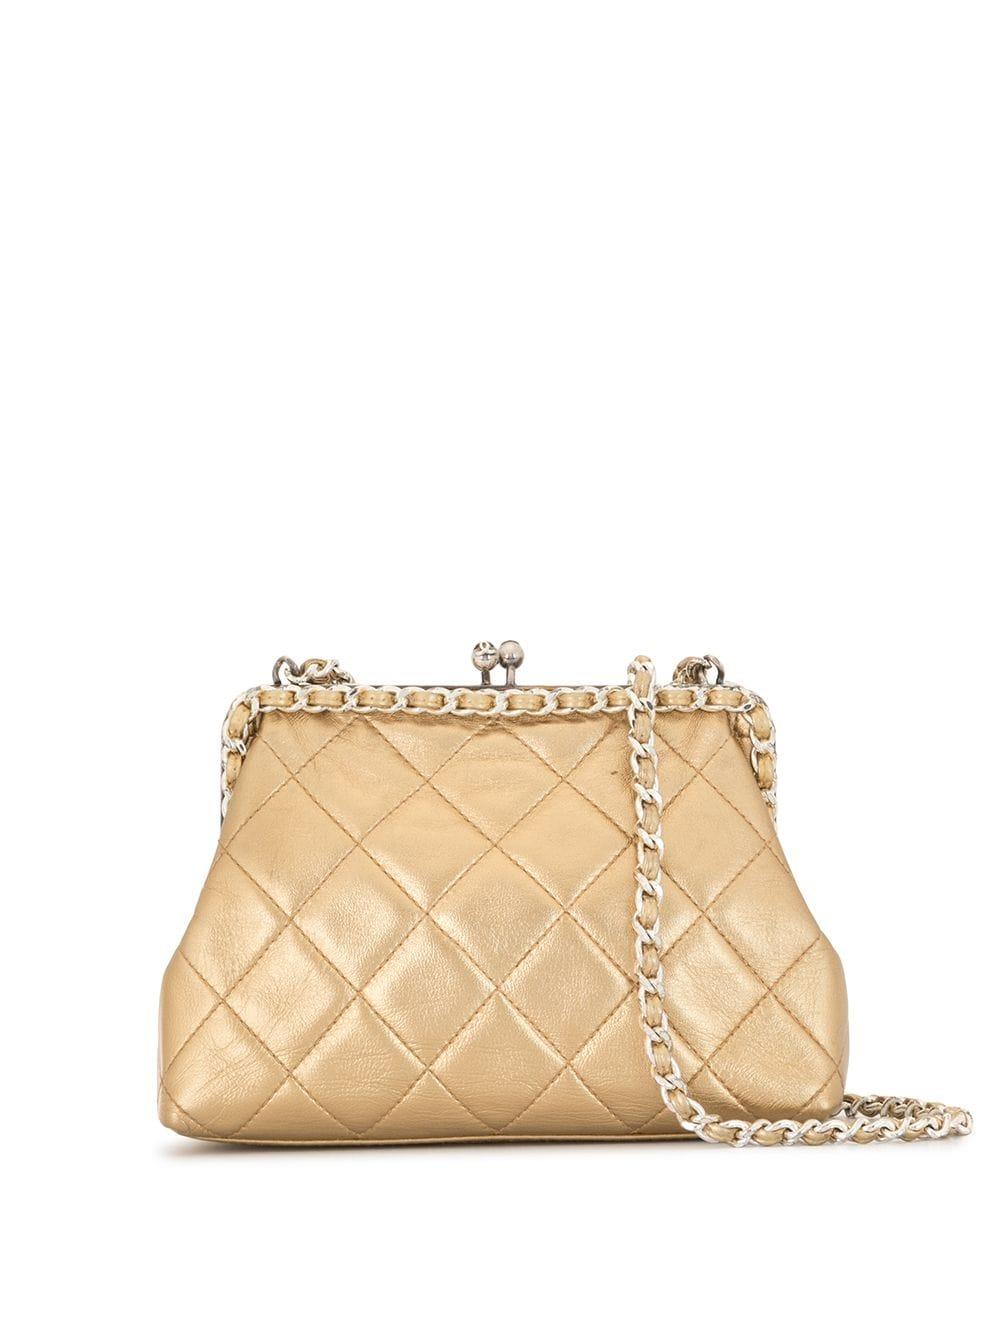 Chanel Pre-Owned Gesteppte Umhängetasche - Gold